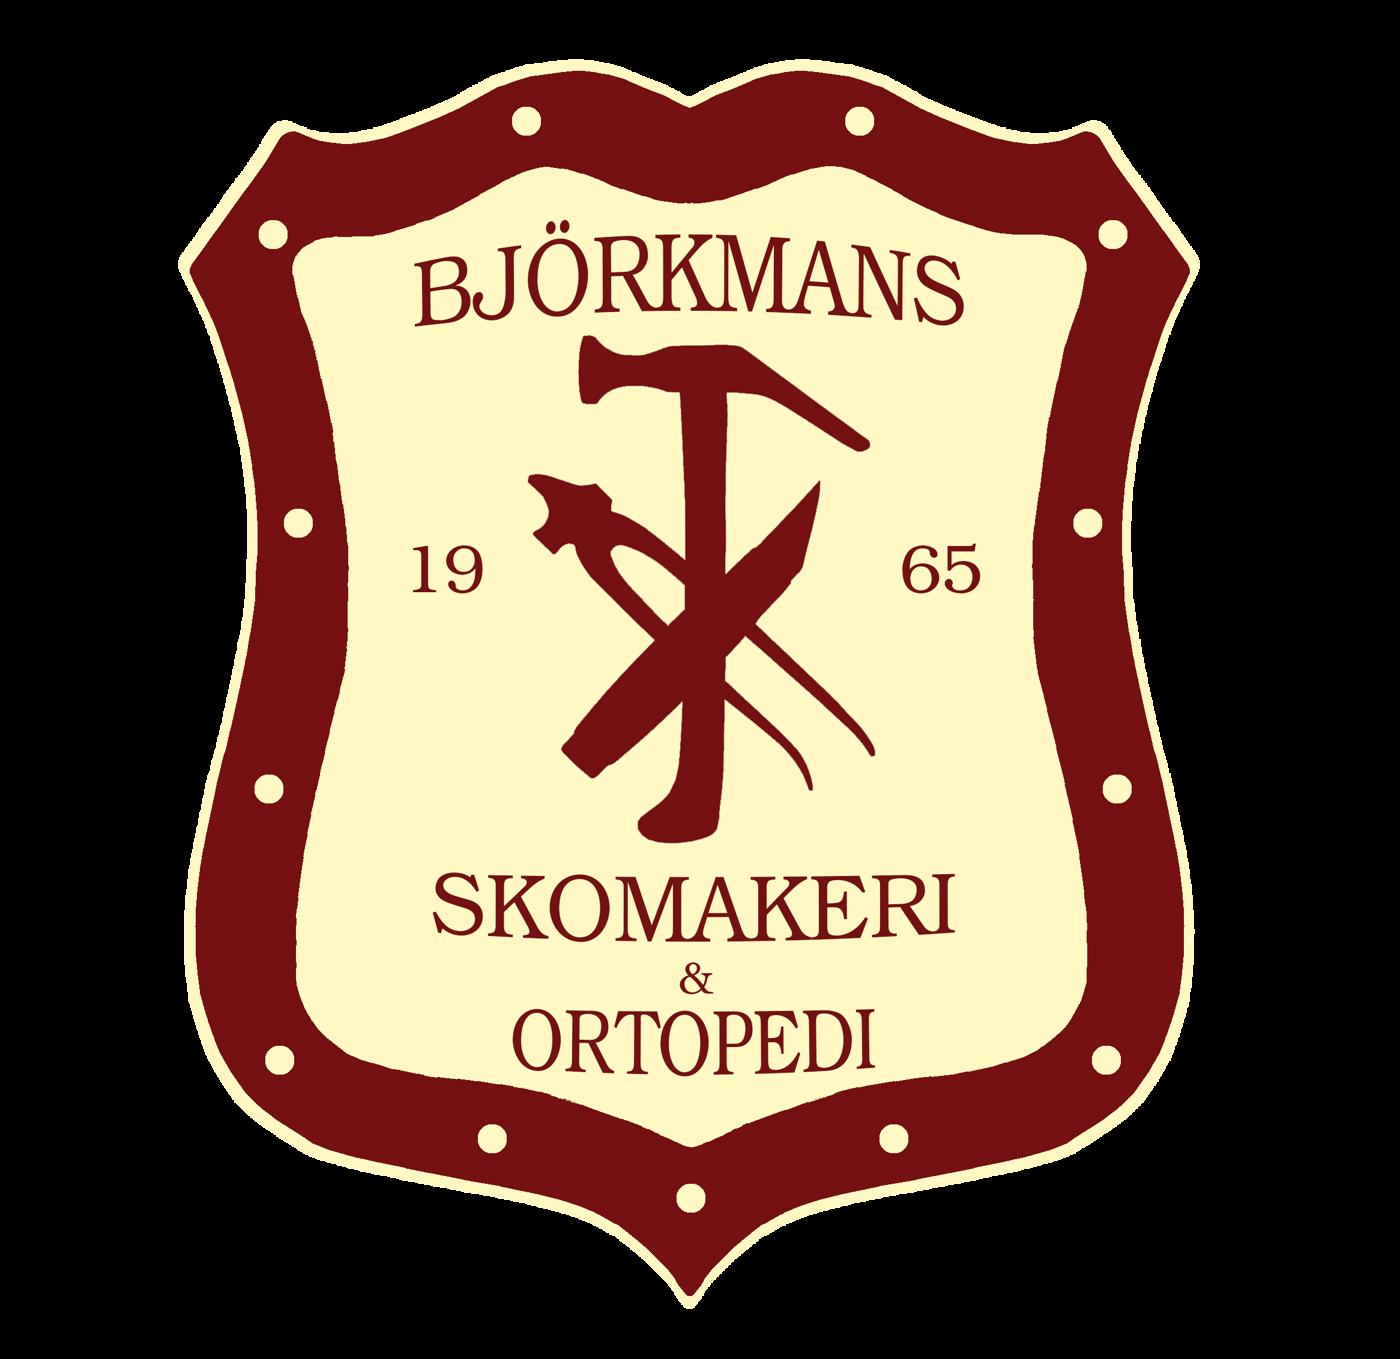 Skomakeri (kopia)